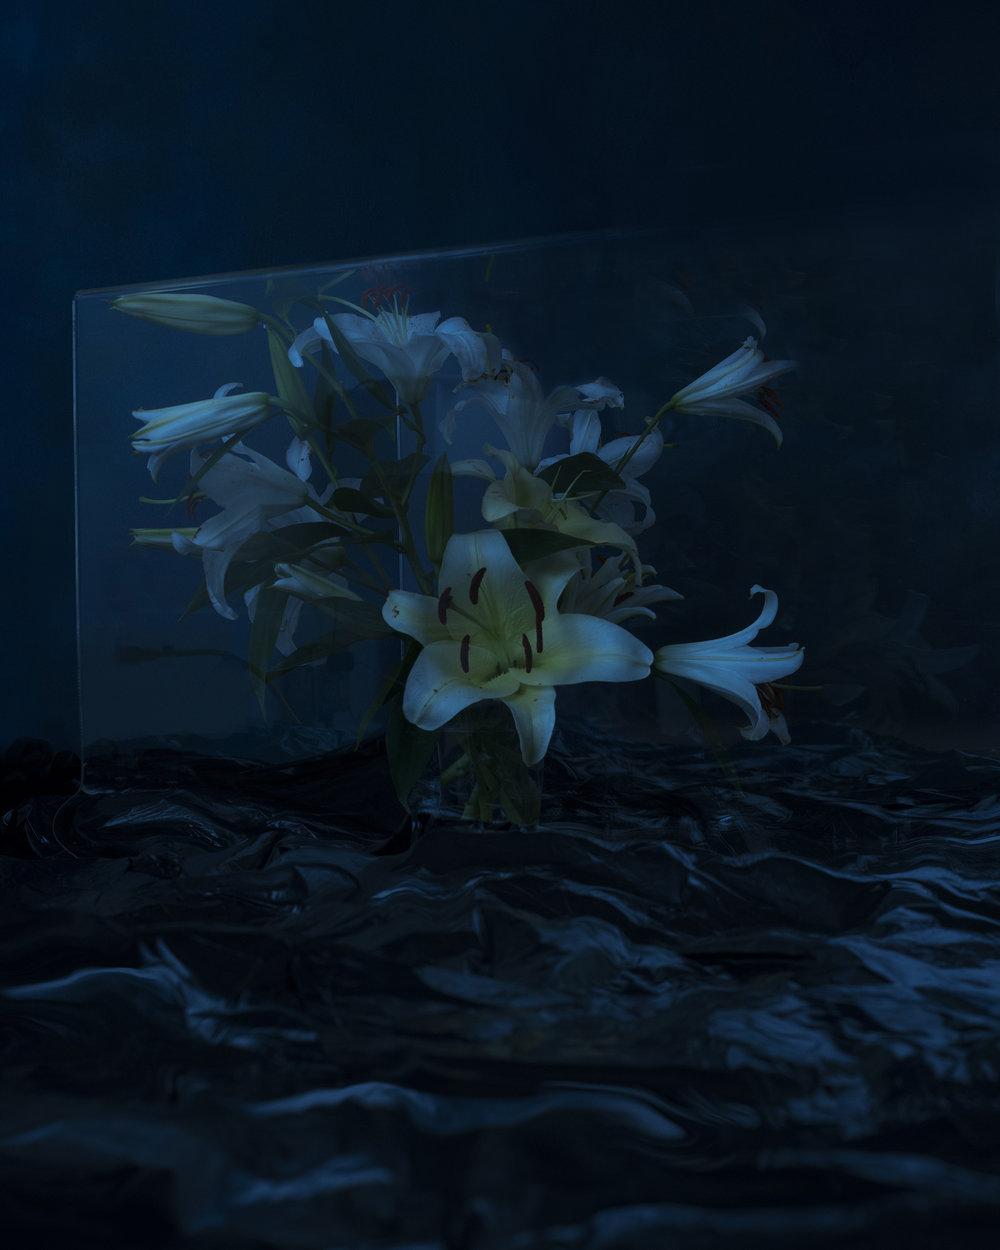 Valeria_Serpent Botanical_01Productions_flowers8.jpg